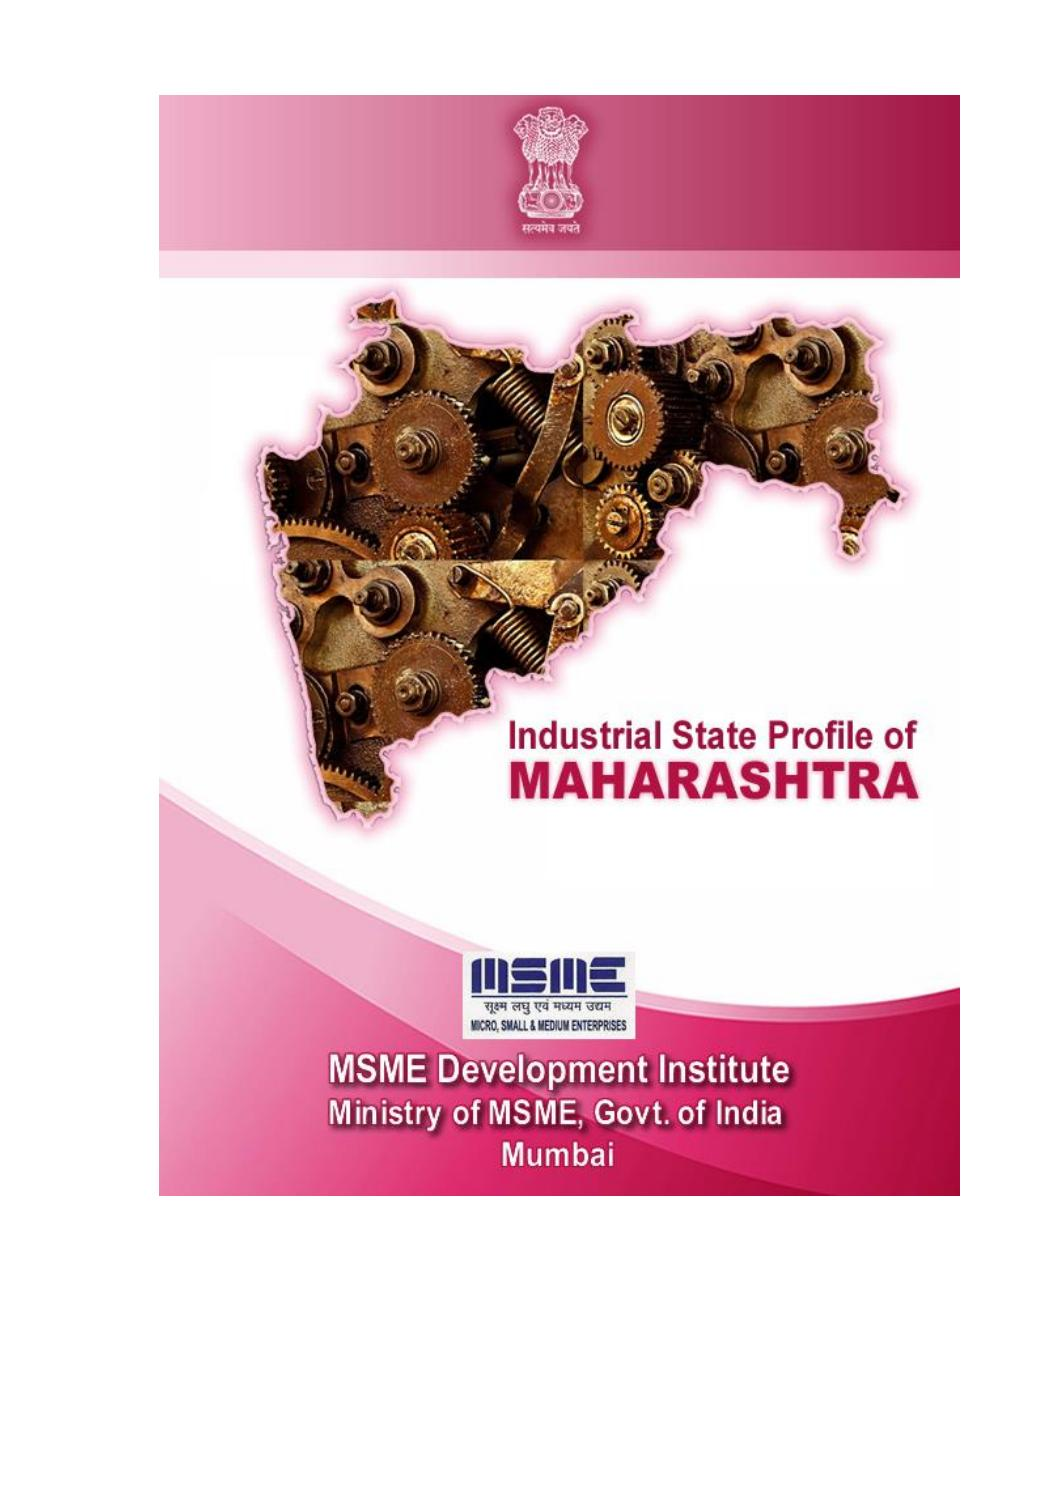 Industrial state profile 2016 17 by MSMEDI Mumbai - issuu